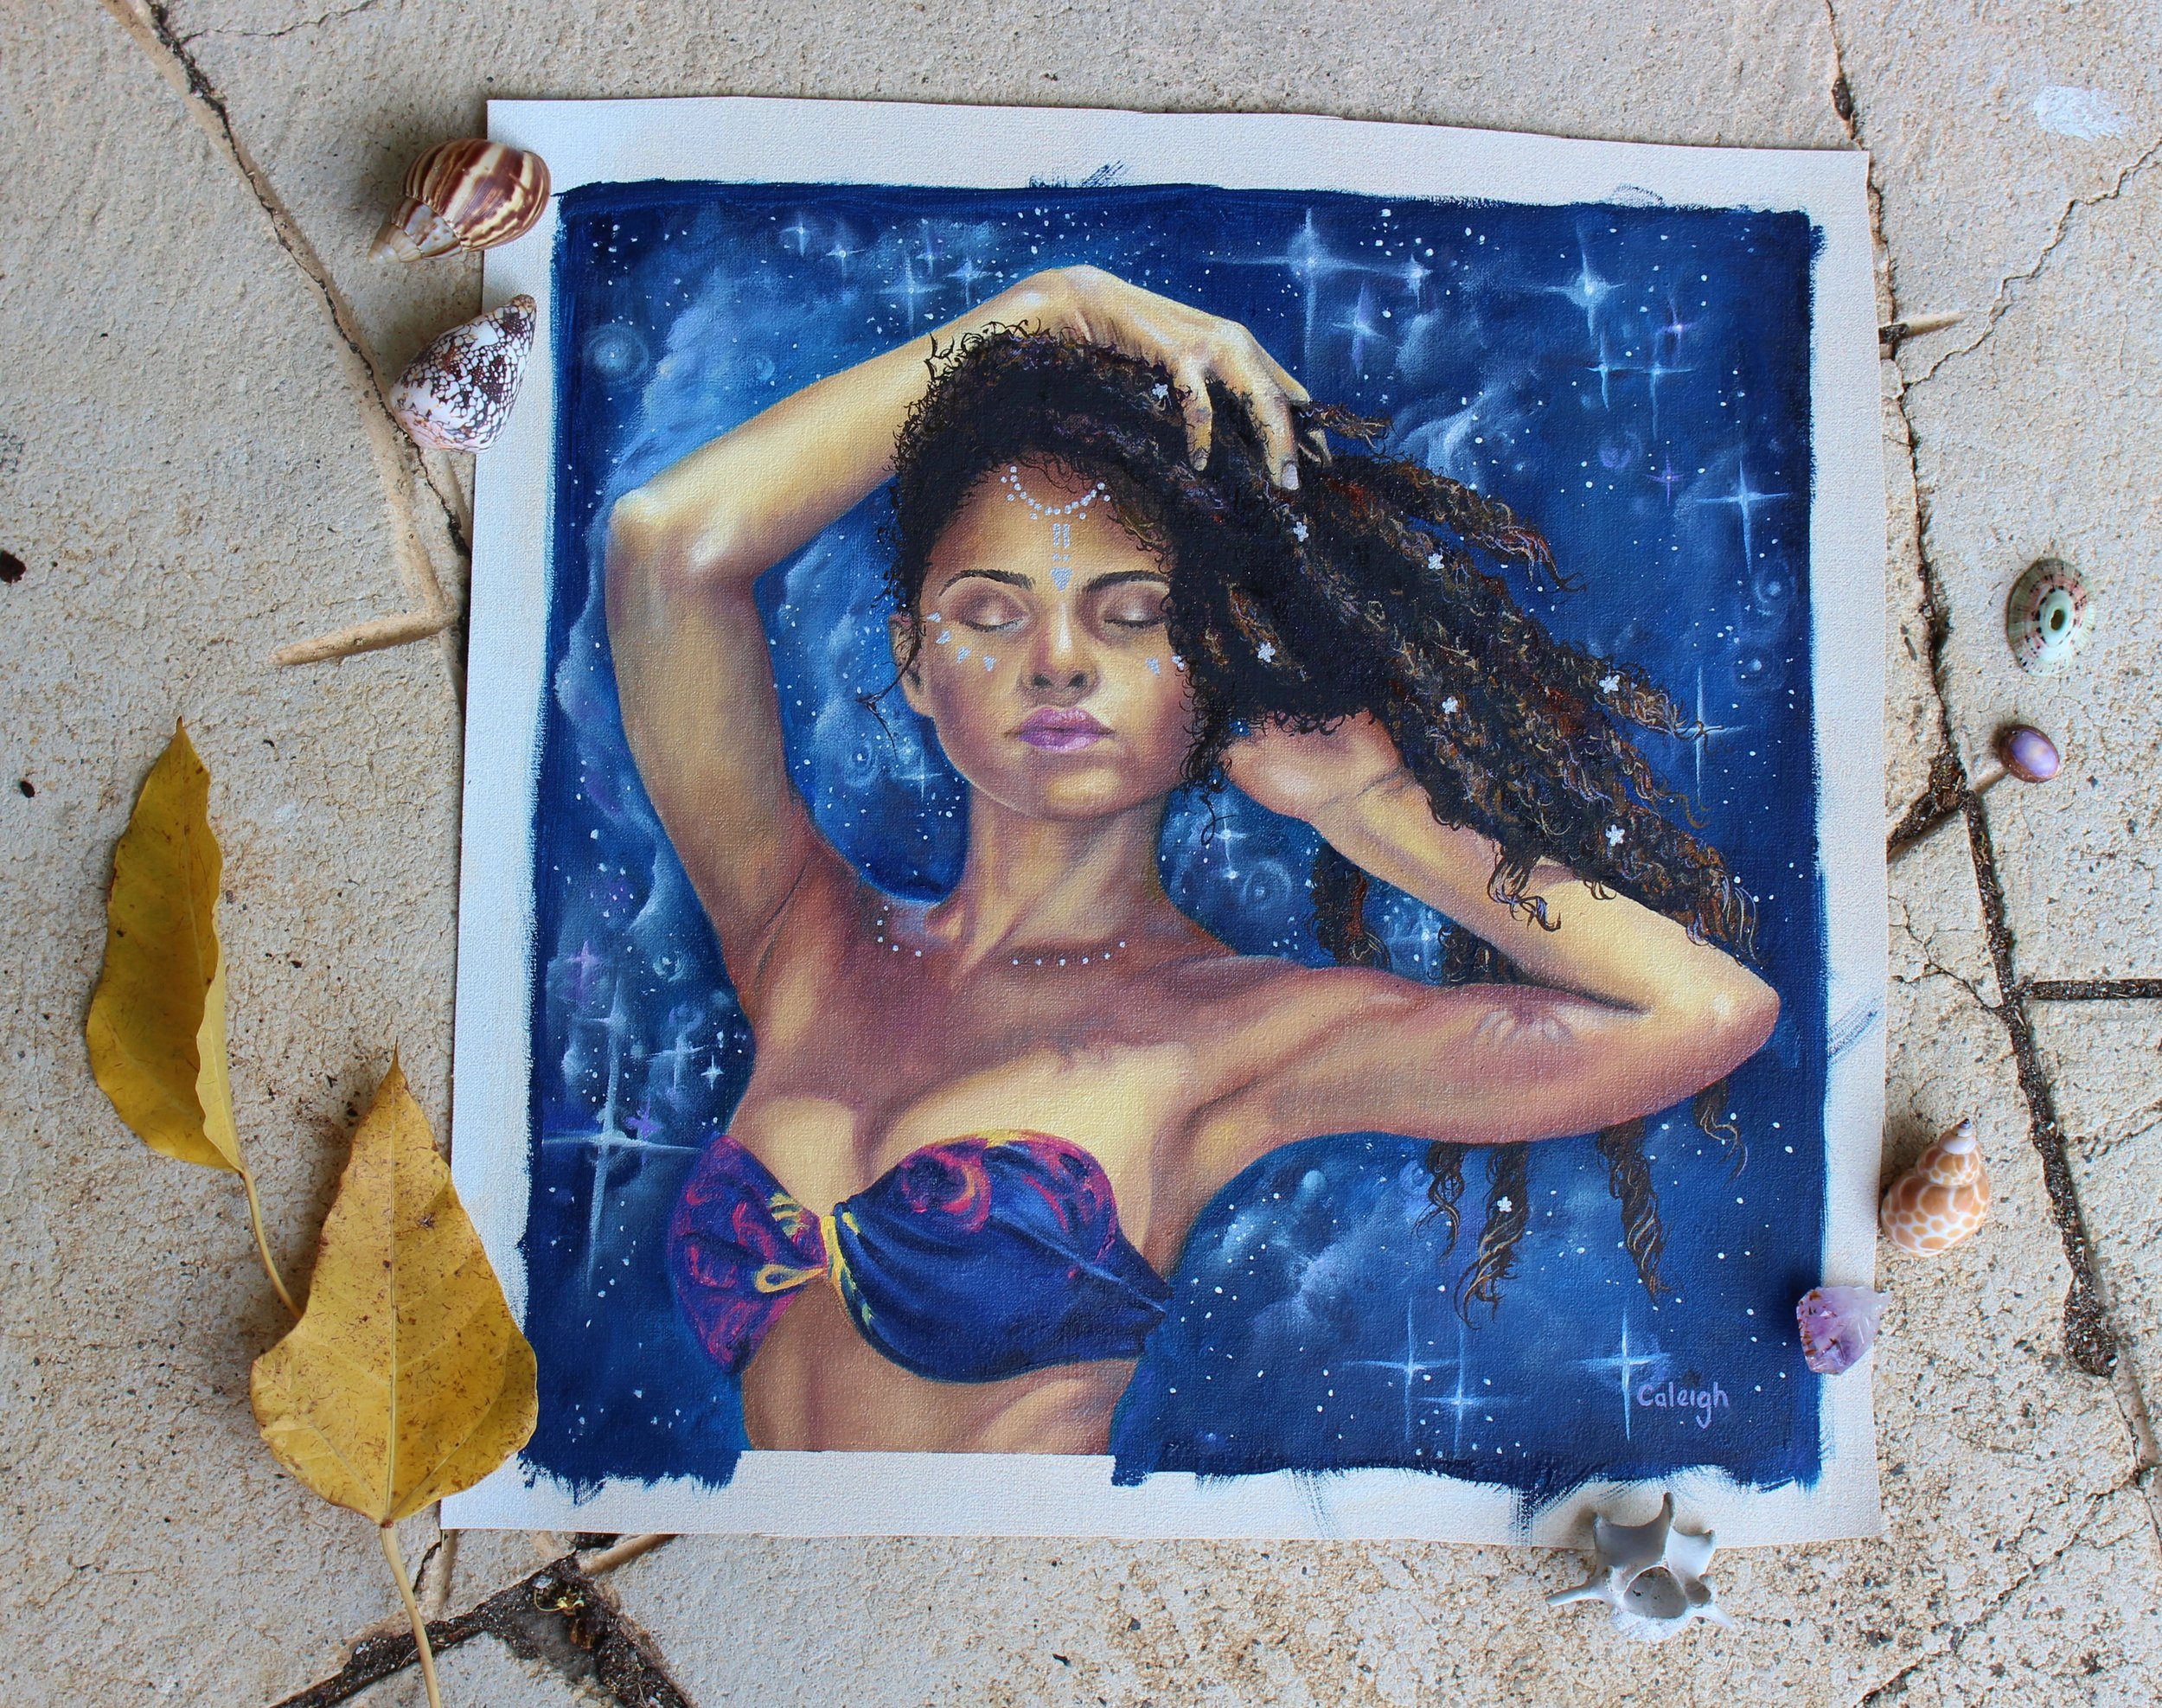 dreadlock goddess artwork